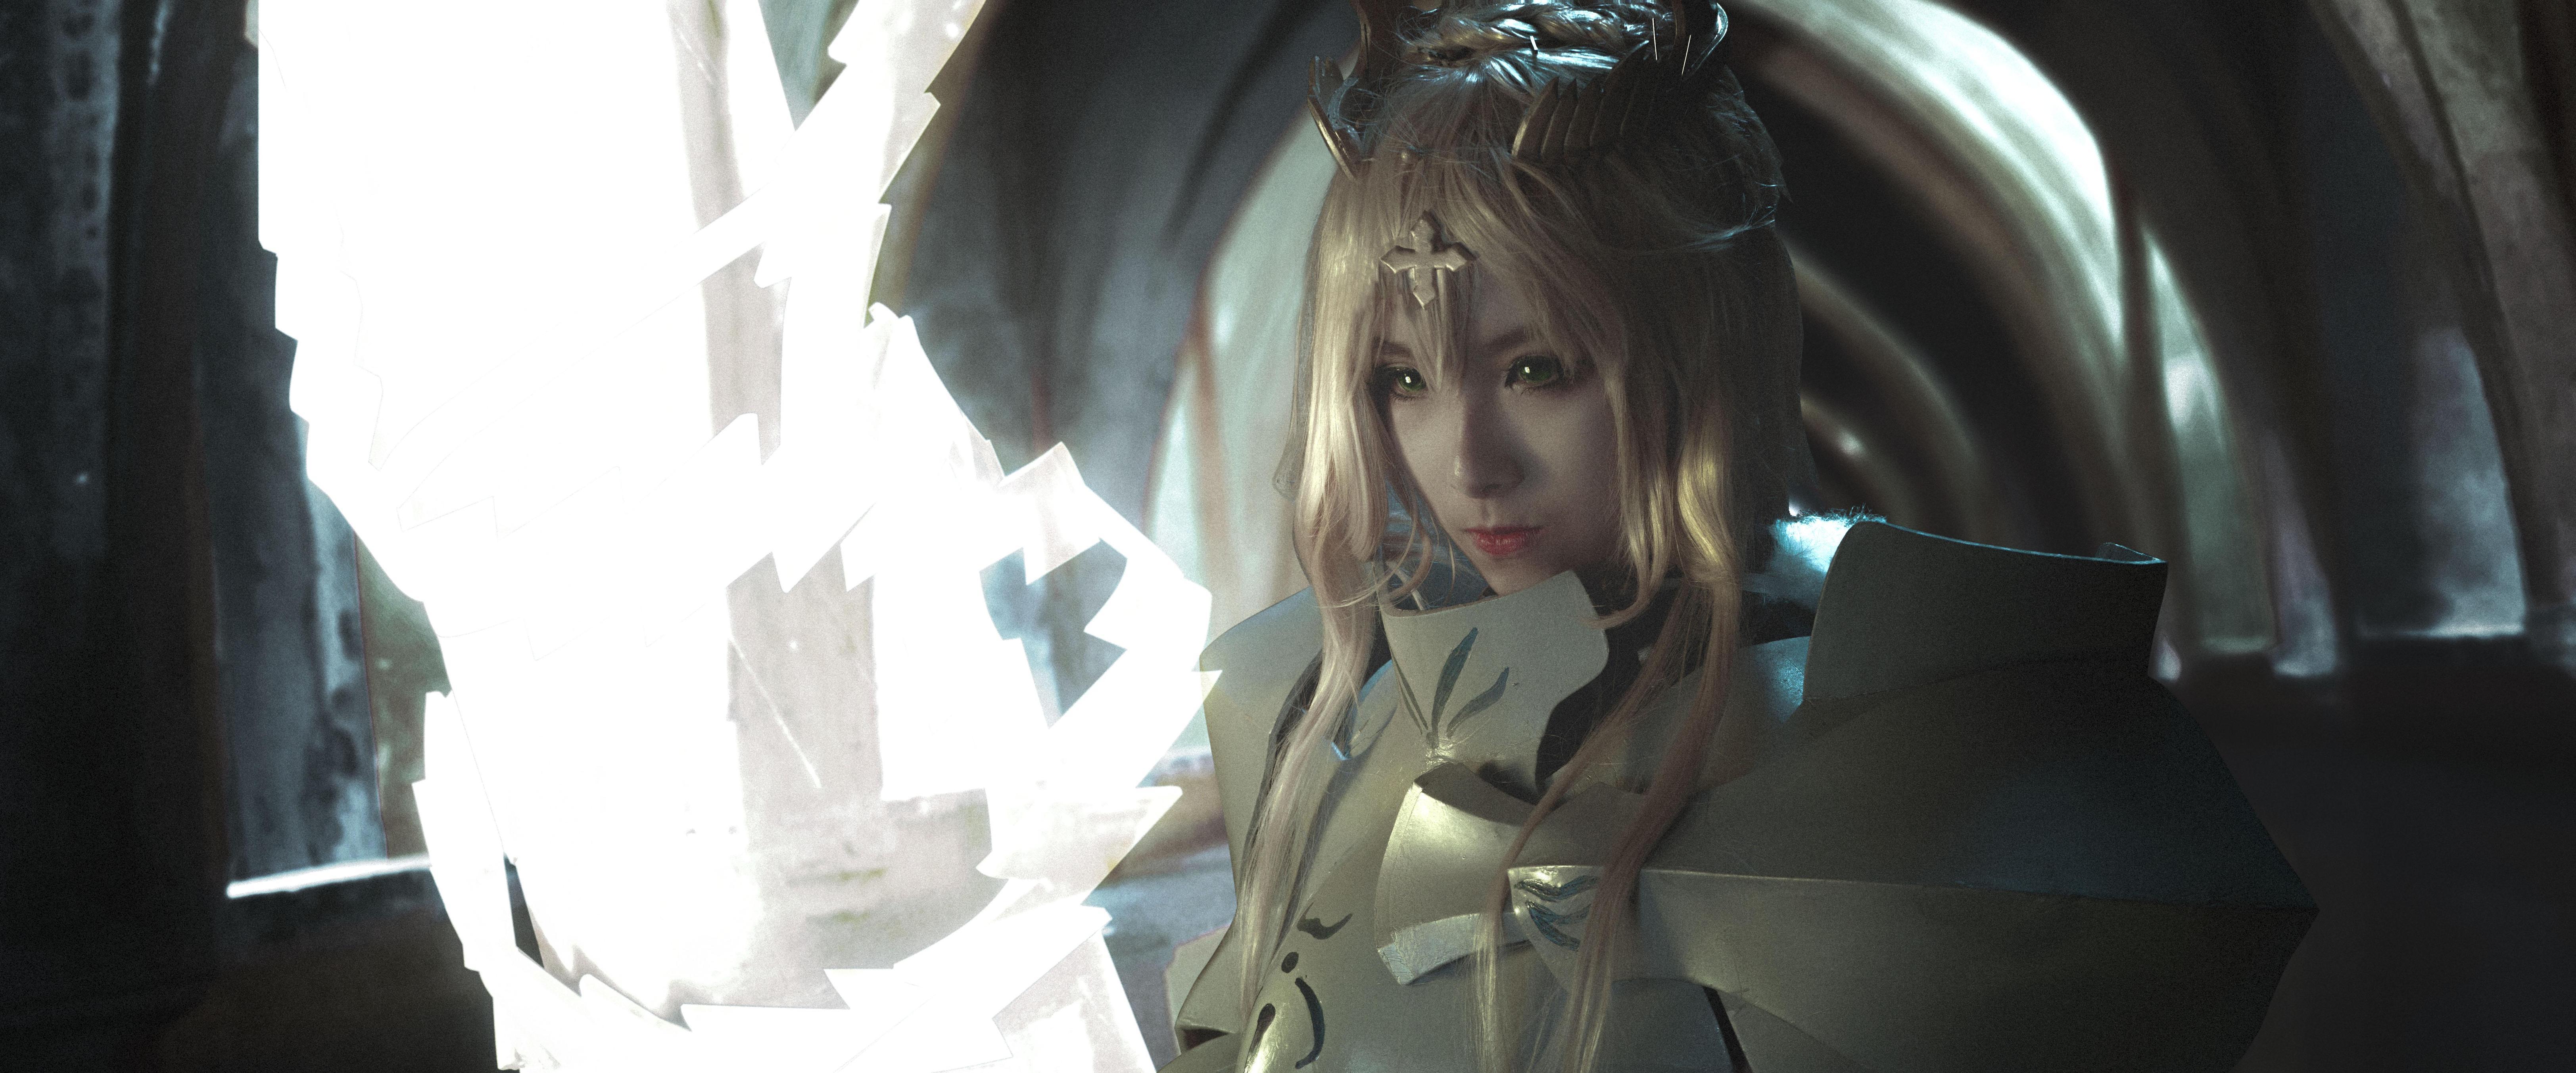 《FATE/ZERO》正片cosplay【CN:艾斯诺提伽】-第4张